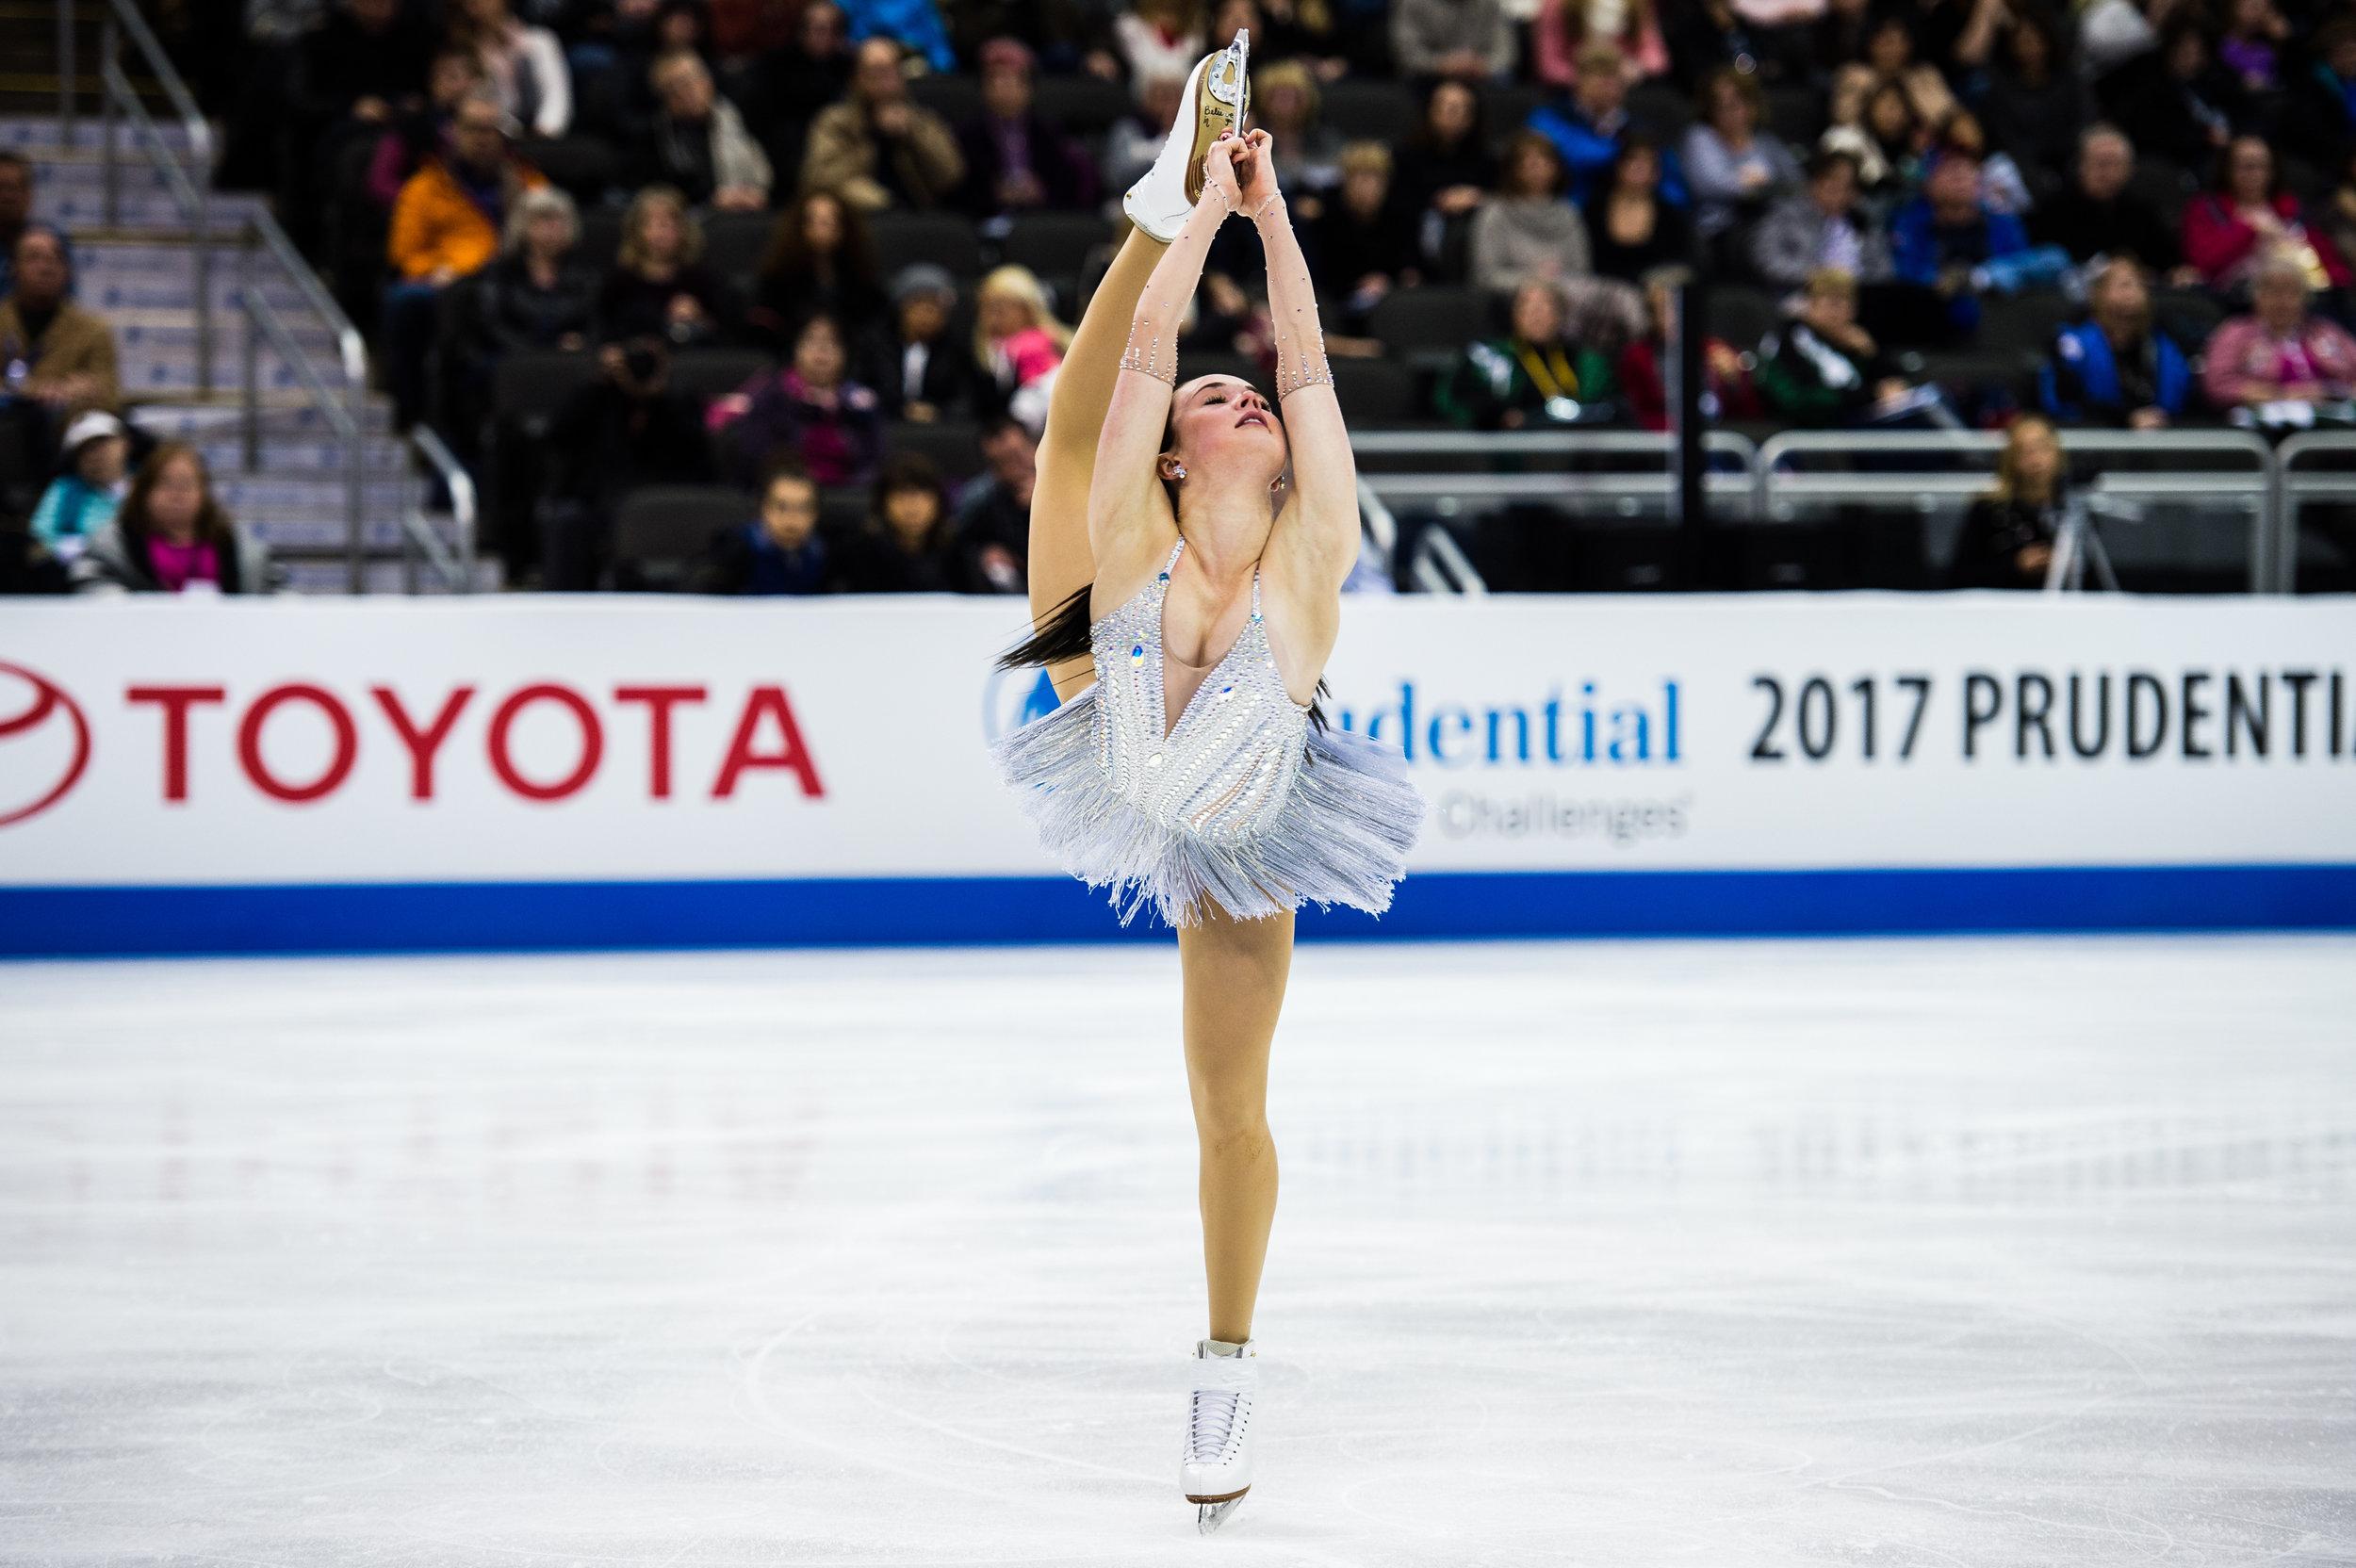 U.S. Figure Skating Championships at Sprint Center - Kansas City